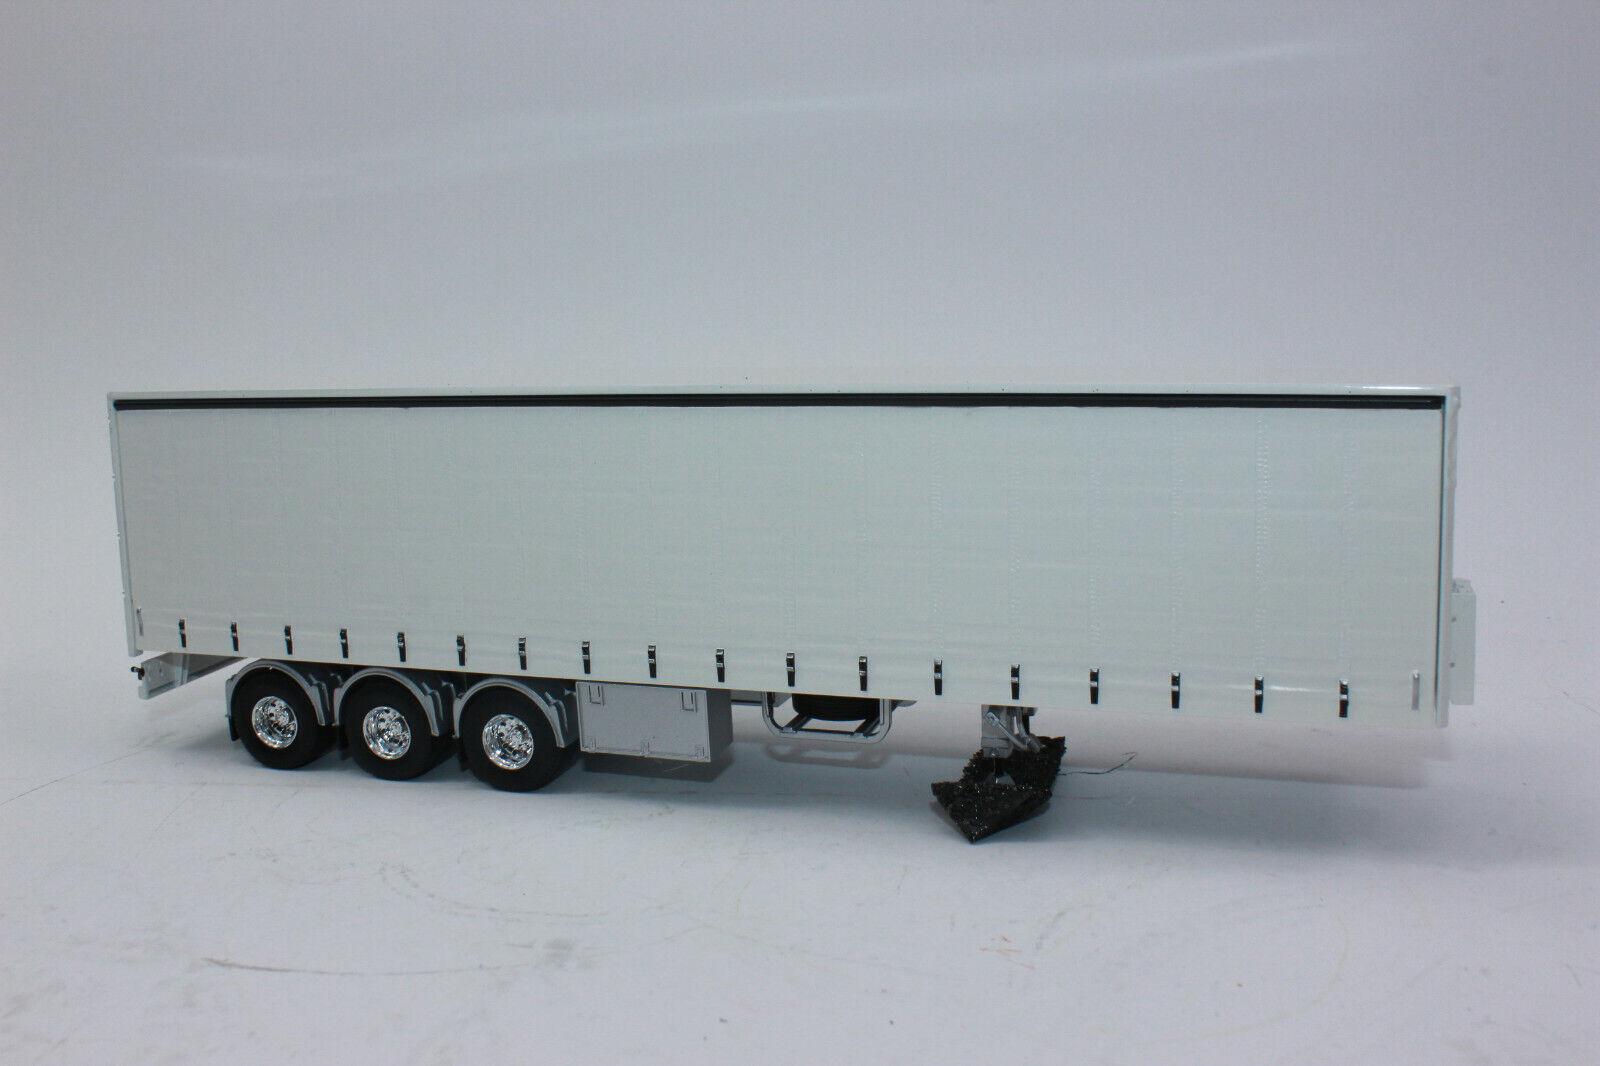 Tekno 74009 Australian curtainside tráiler hummer para camiones 1 50 nuevo en OVP